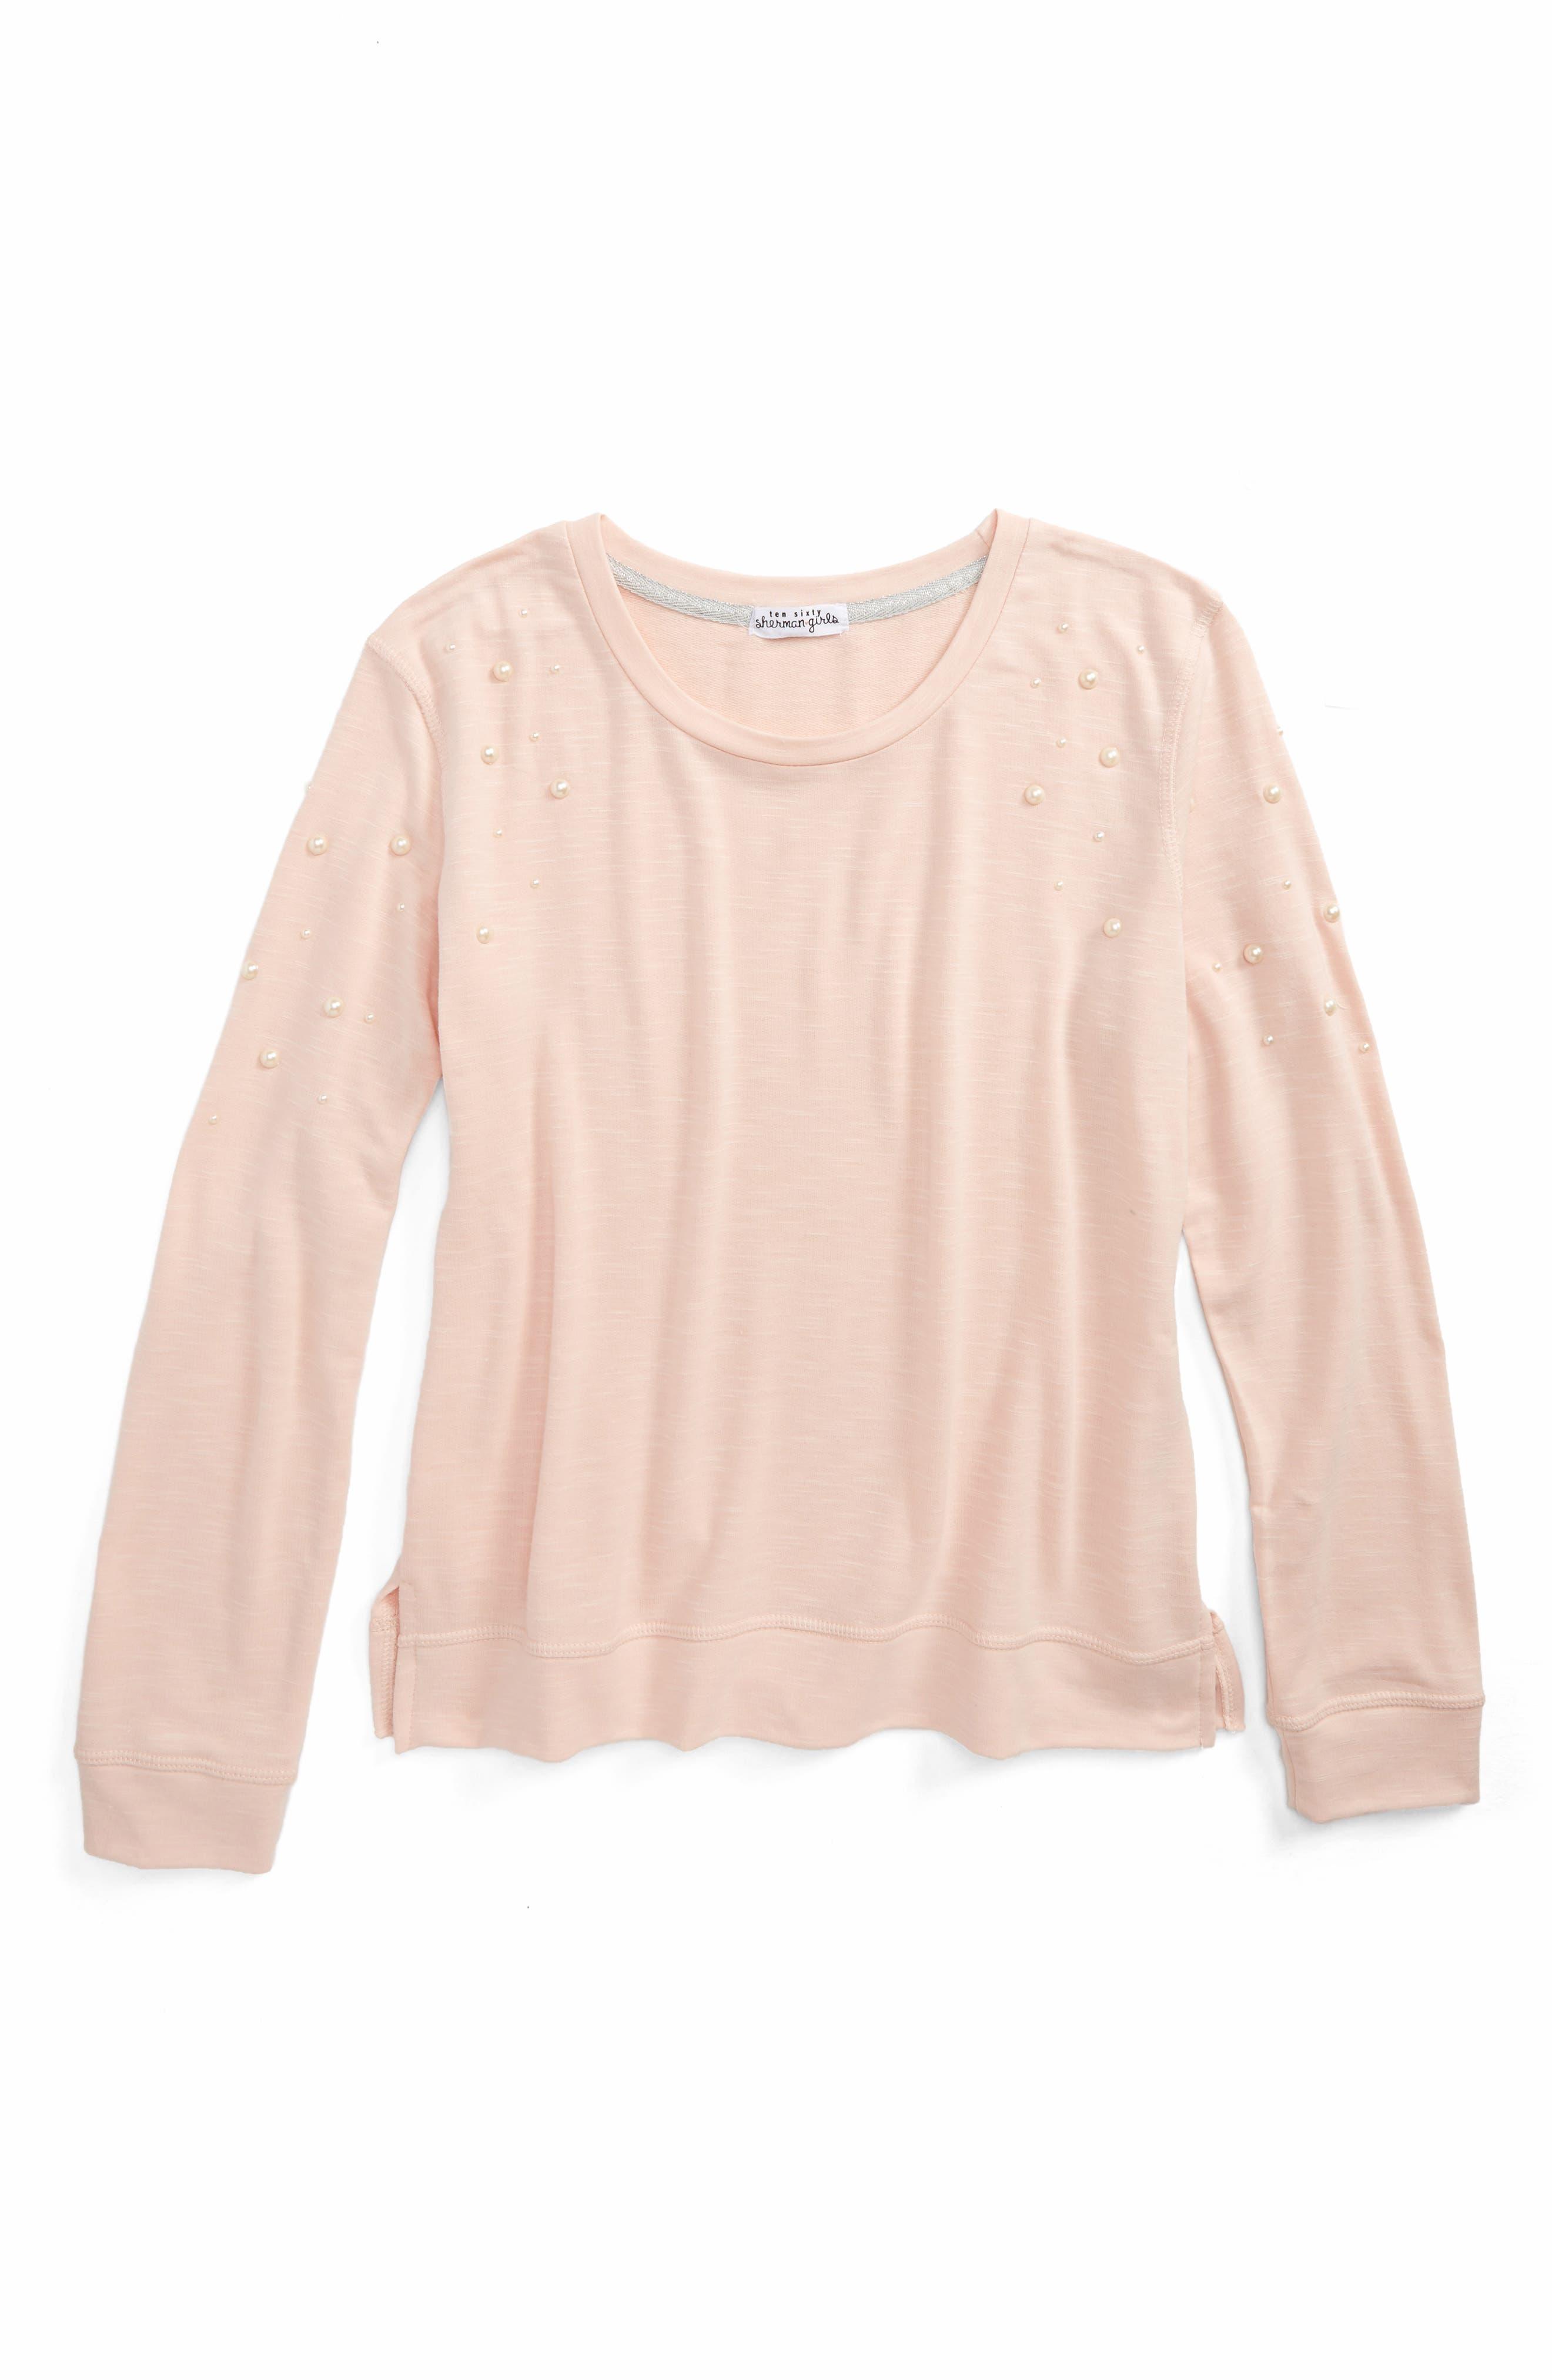 Imitation Pearl Embellished Sweatshirt,                             Main thumbnail 1, color,                             Blush